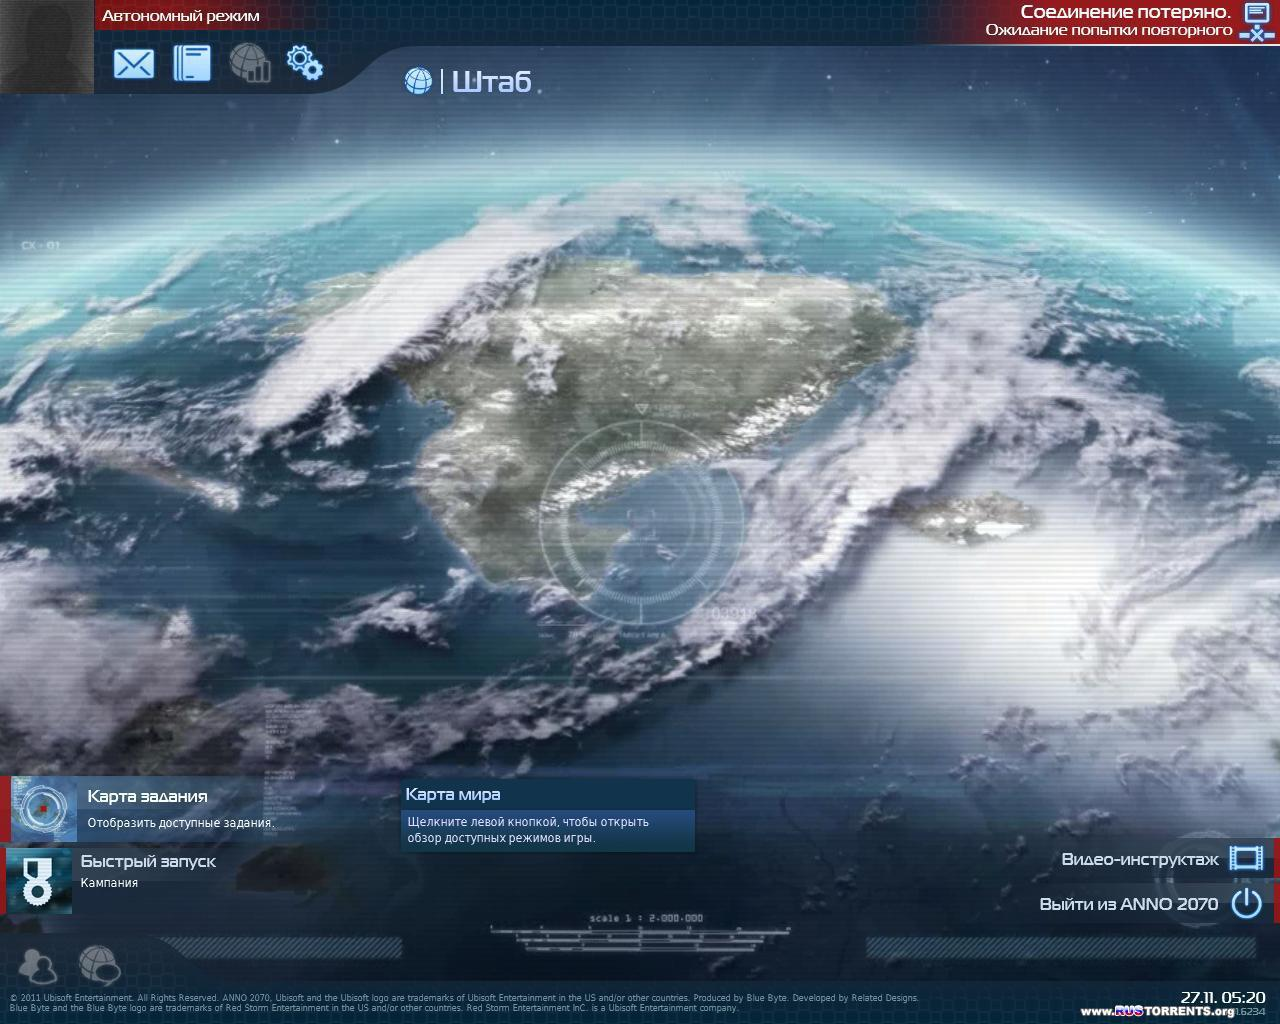 Anno 2070 Deluxe Edition v 1.0.1.6234 I Repack от Fenixx